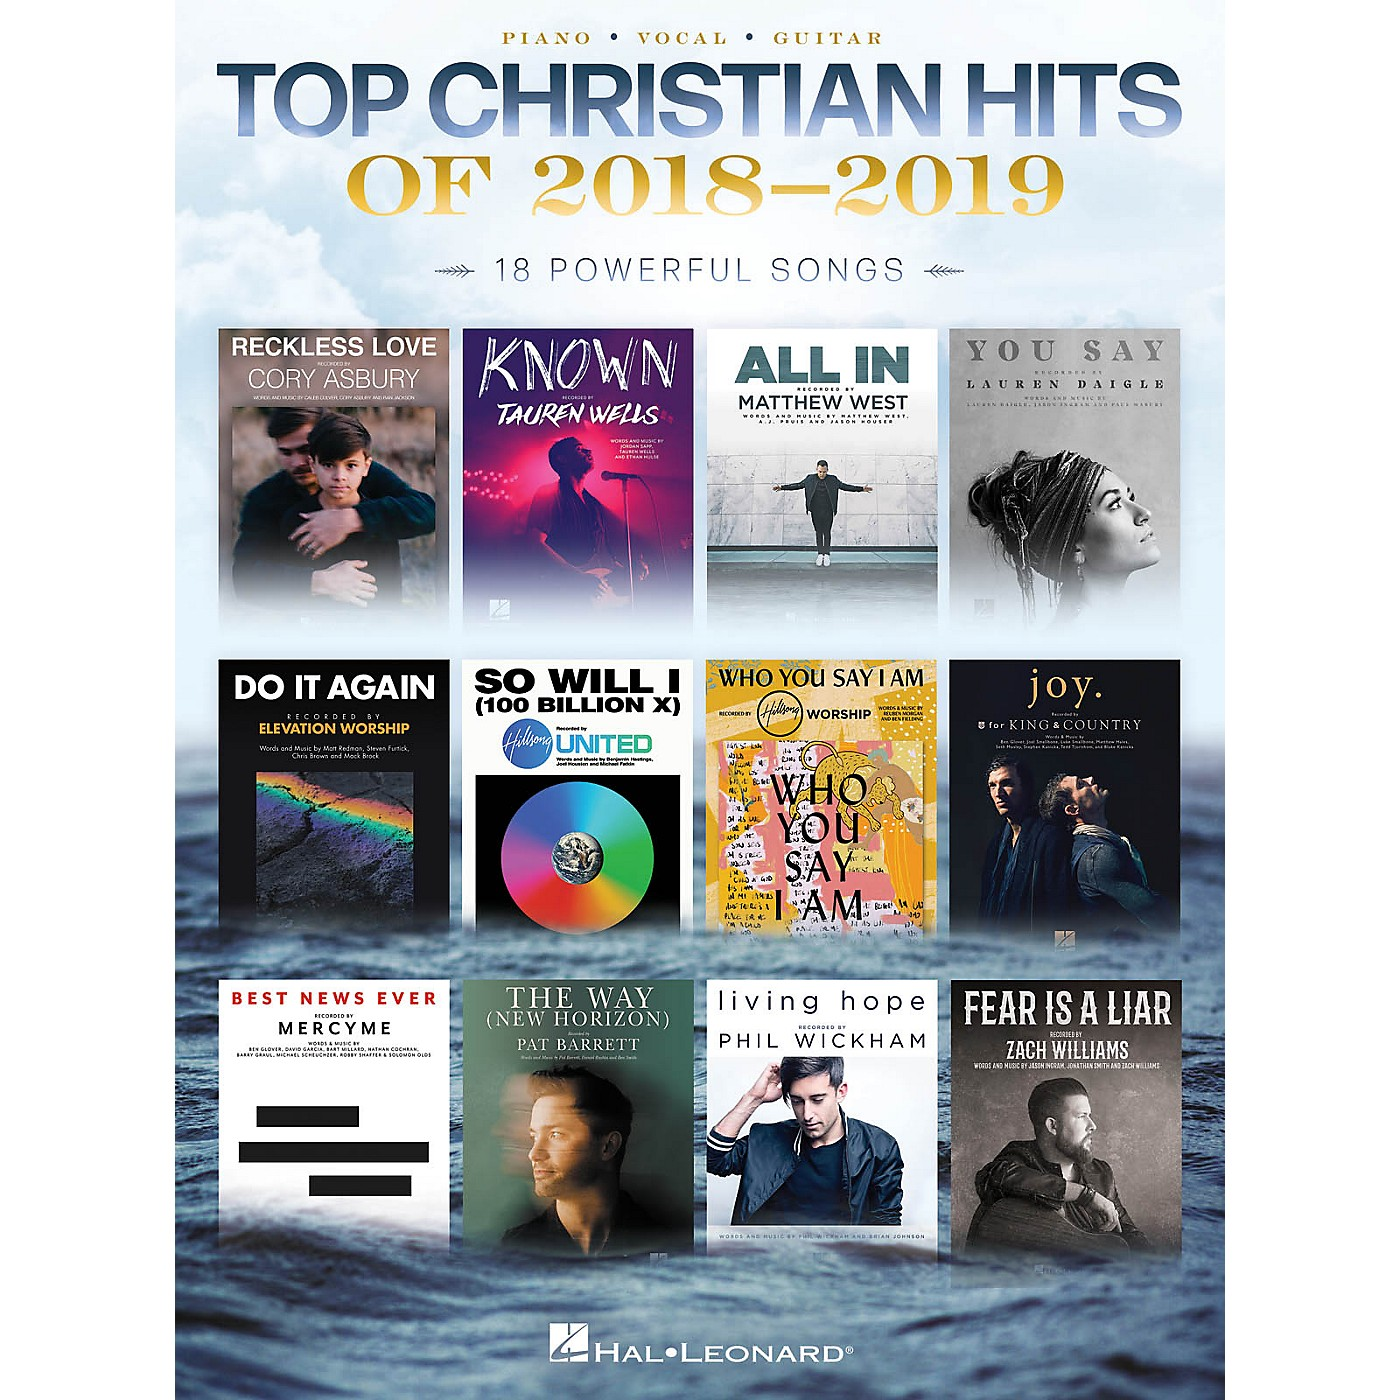 Hal Leonard Top Christian Hits of 2018-2019 Piano/Vocal/Guitar Songbook thumbnail